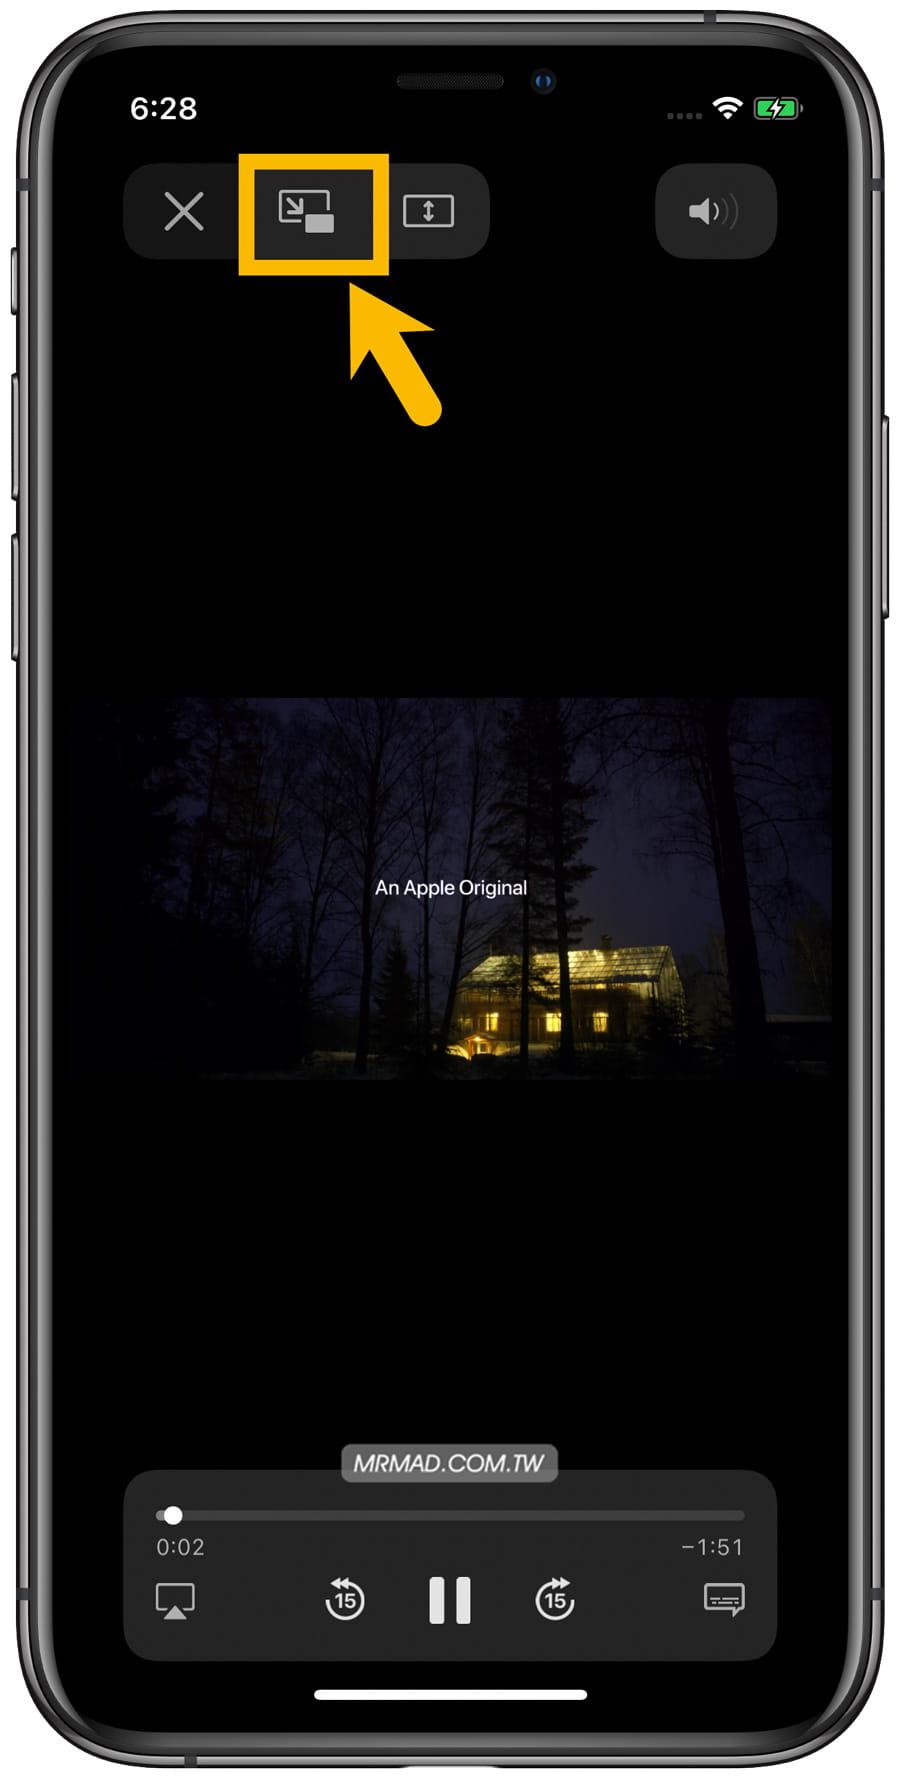 iOS 14子母畫面操作教學1